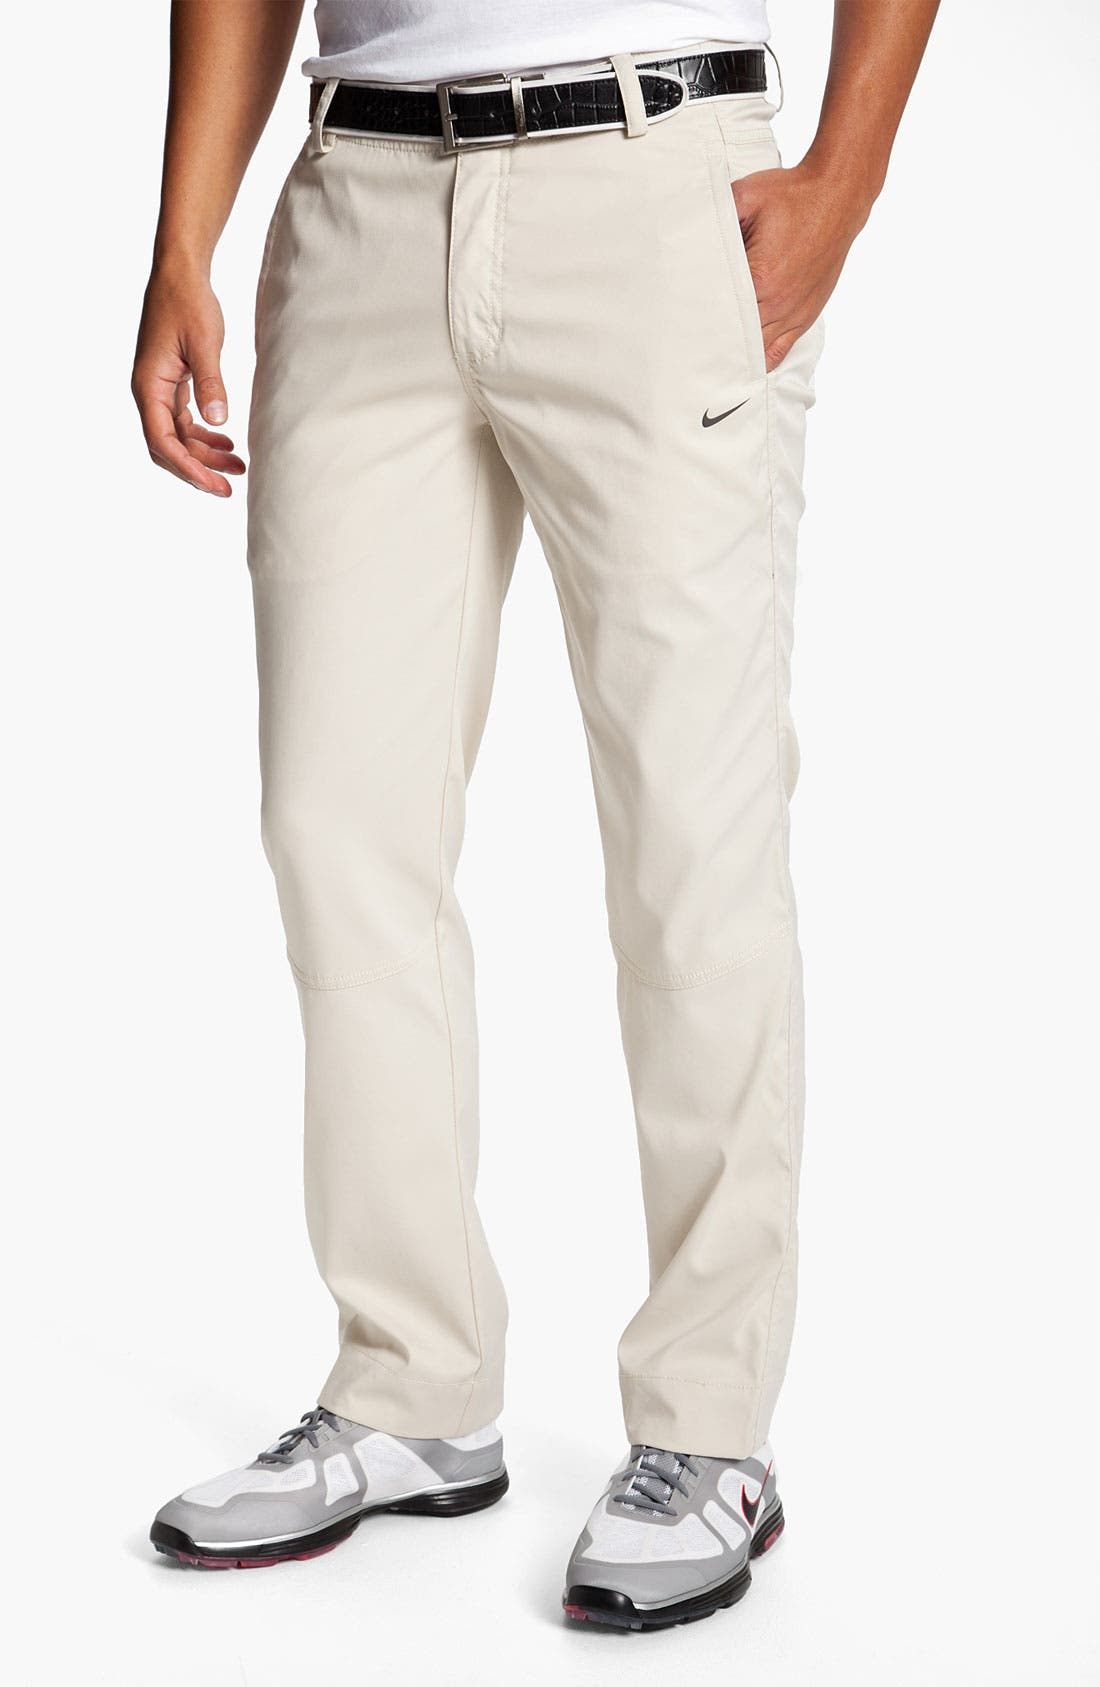 Alternate Image 1 Selected - Nike Golf 'Sport Novelty' Dri-FIT Golf Pants